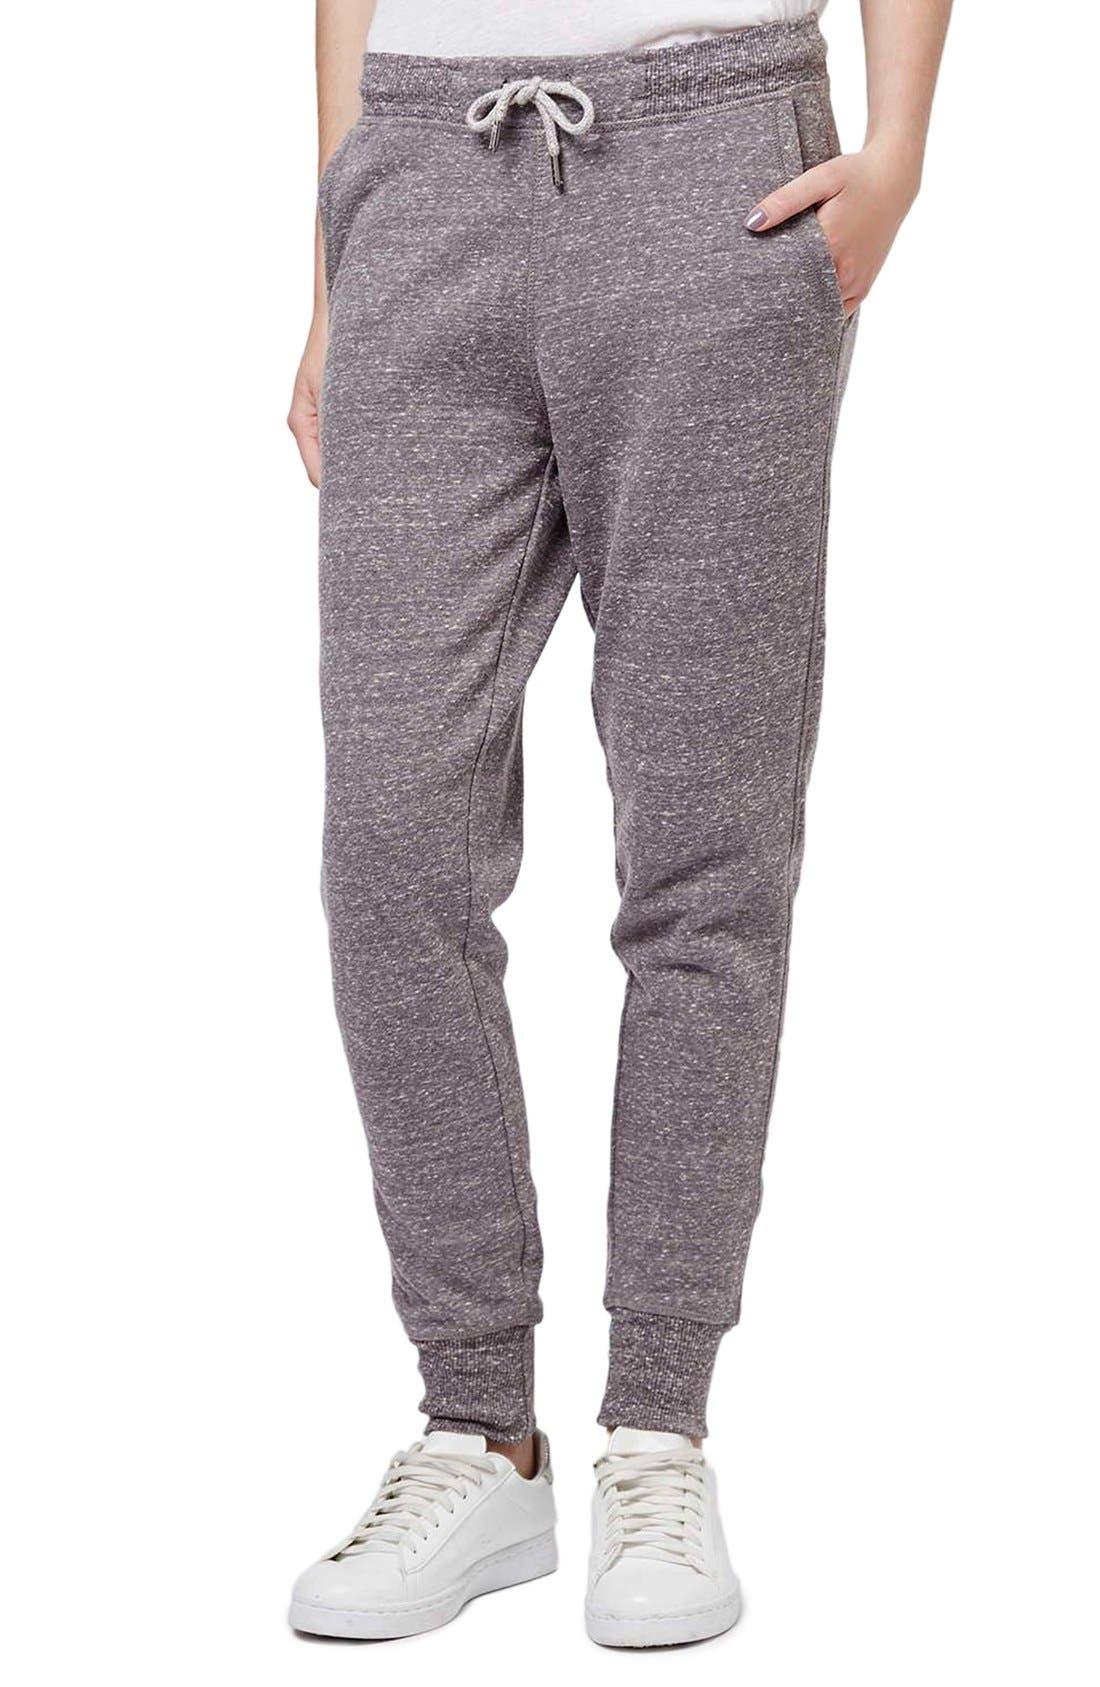 Alternate Image 1 Selected - Topshop Skinny Fit Jogger Pants